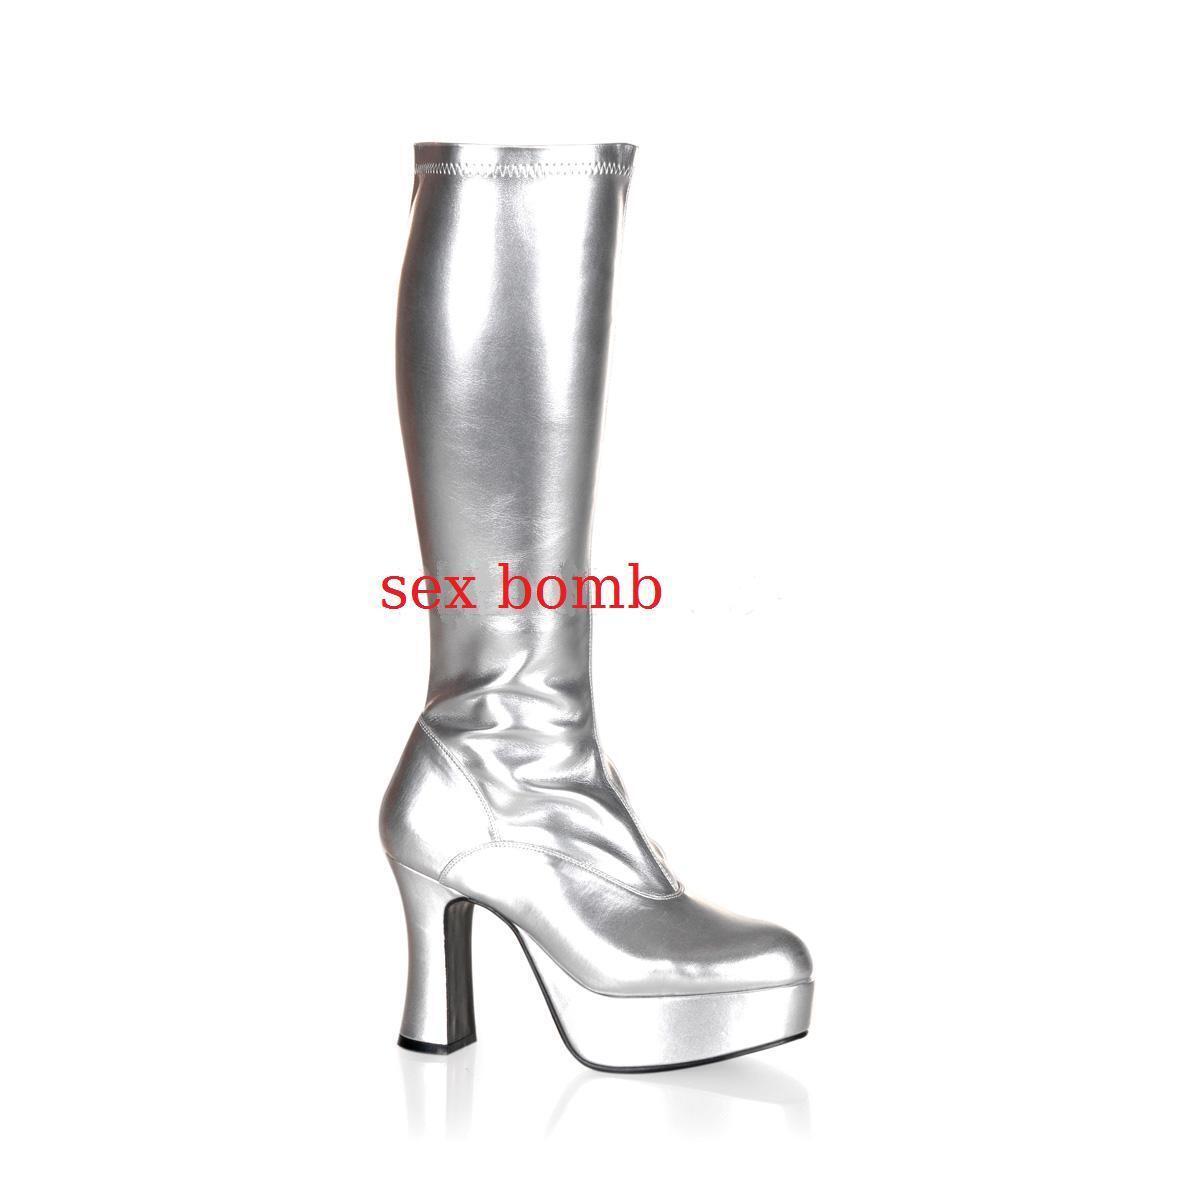 si affrettò a vedere Sexy STIVALI STIVALI STIVALI plateau tacco 10 dal 36 al 44 argentoO zip cosplay scarpe GLAMOUR  sconto